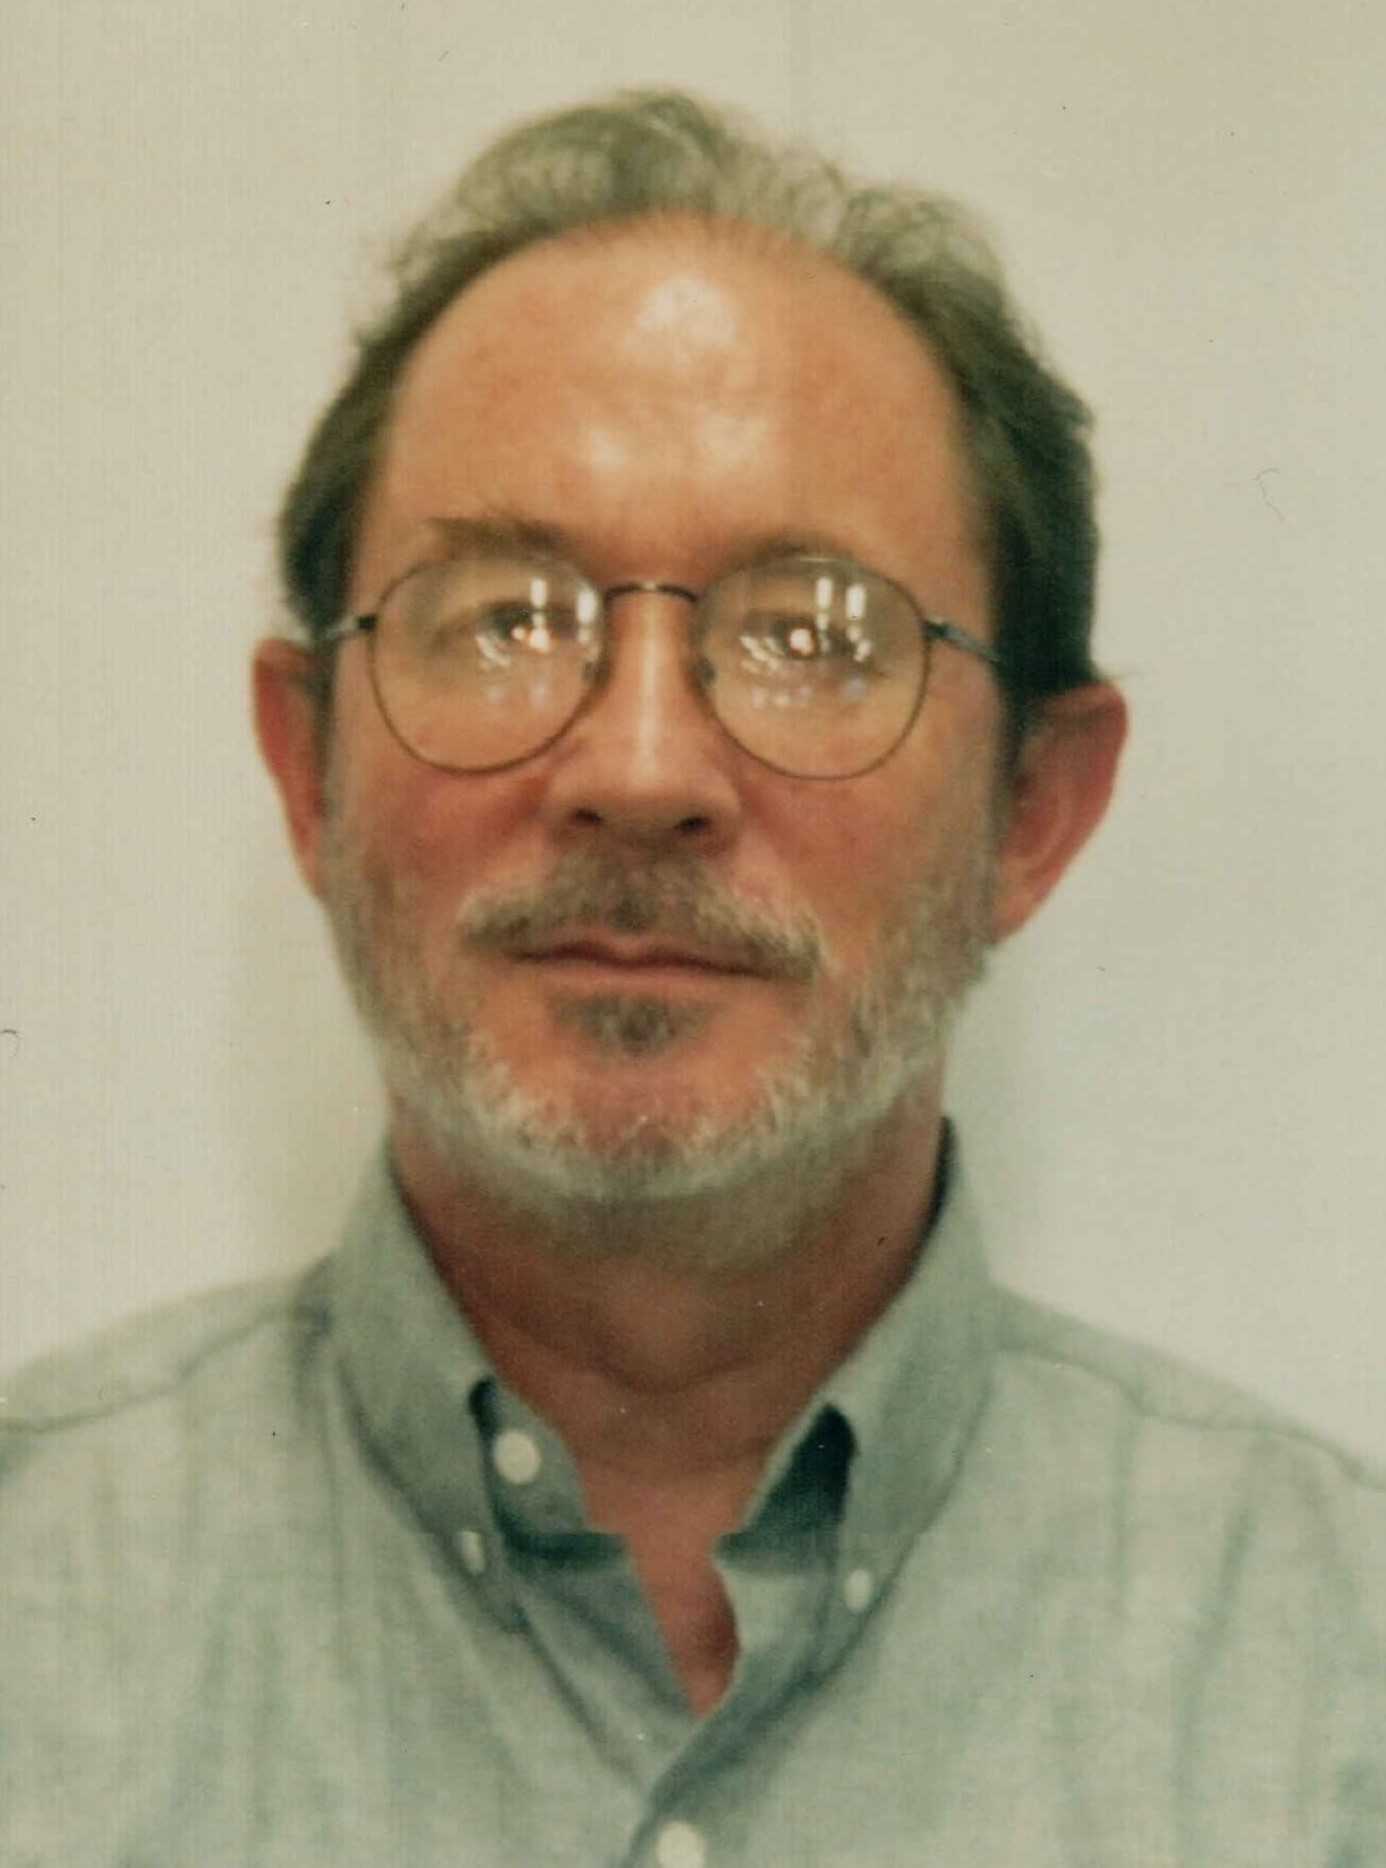 Eric Myers